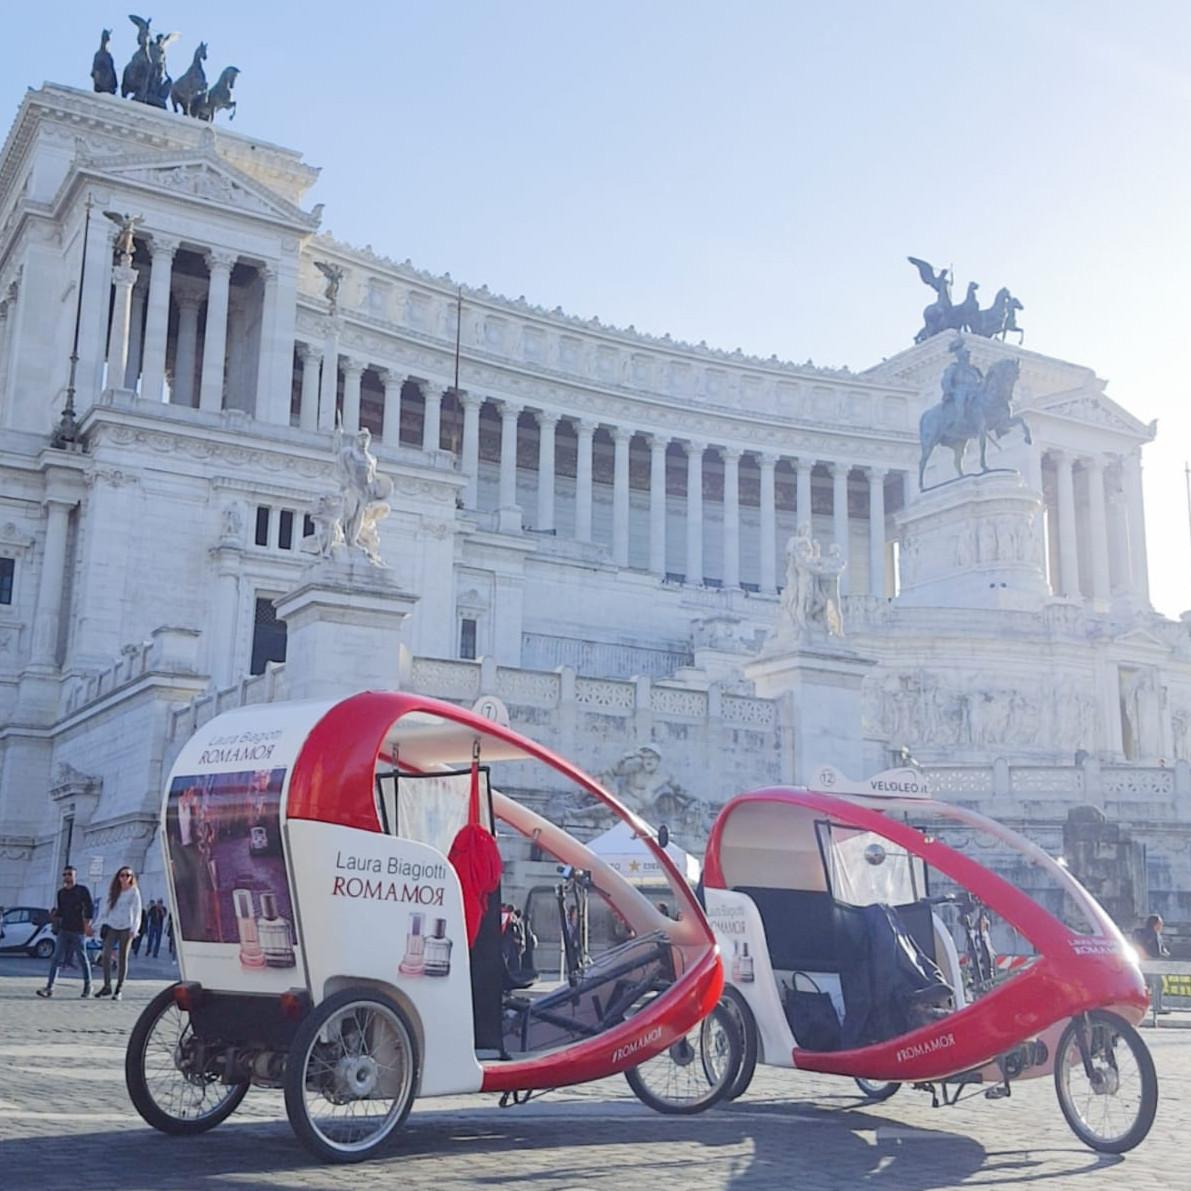 romamor Laura Biagiotti Veloleo Rickshaw risciò